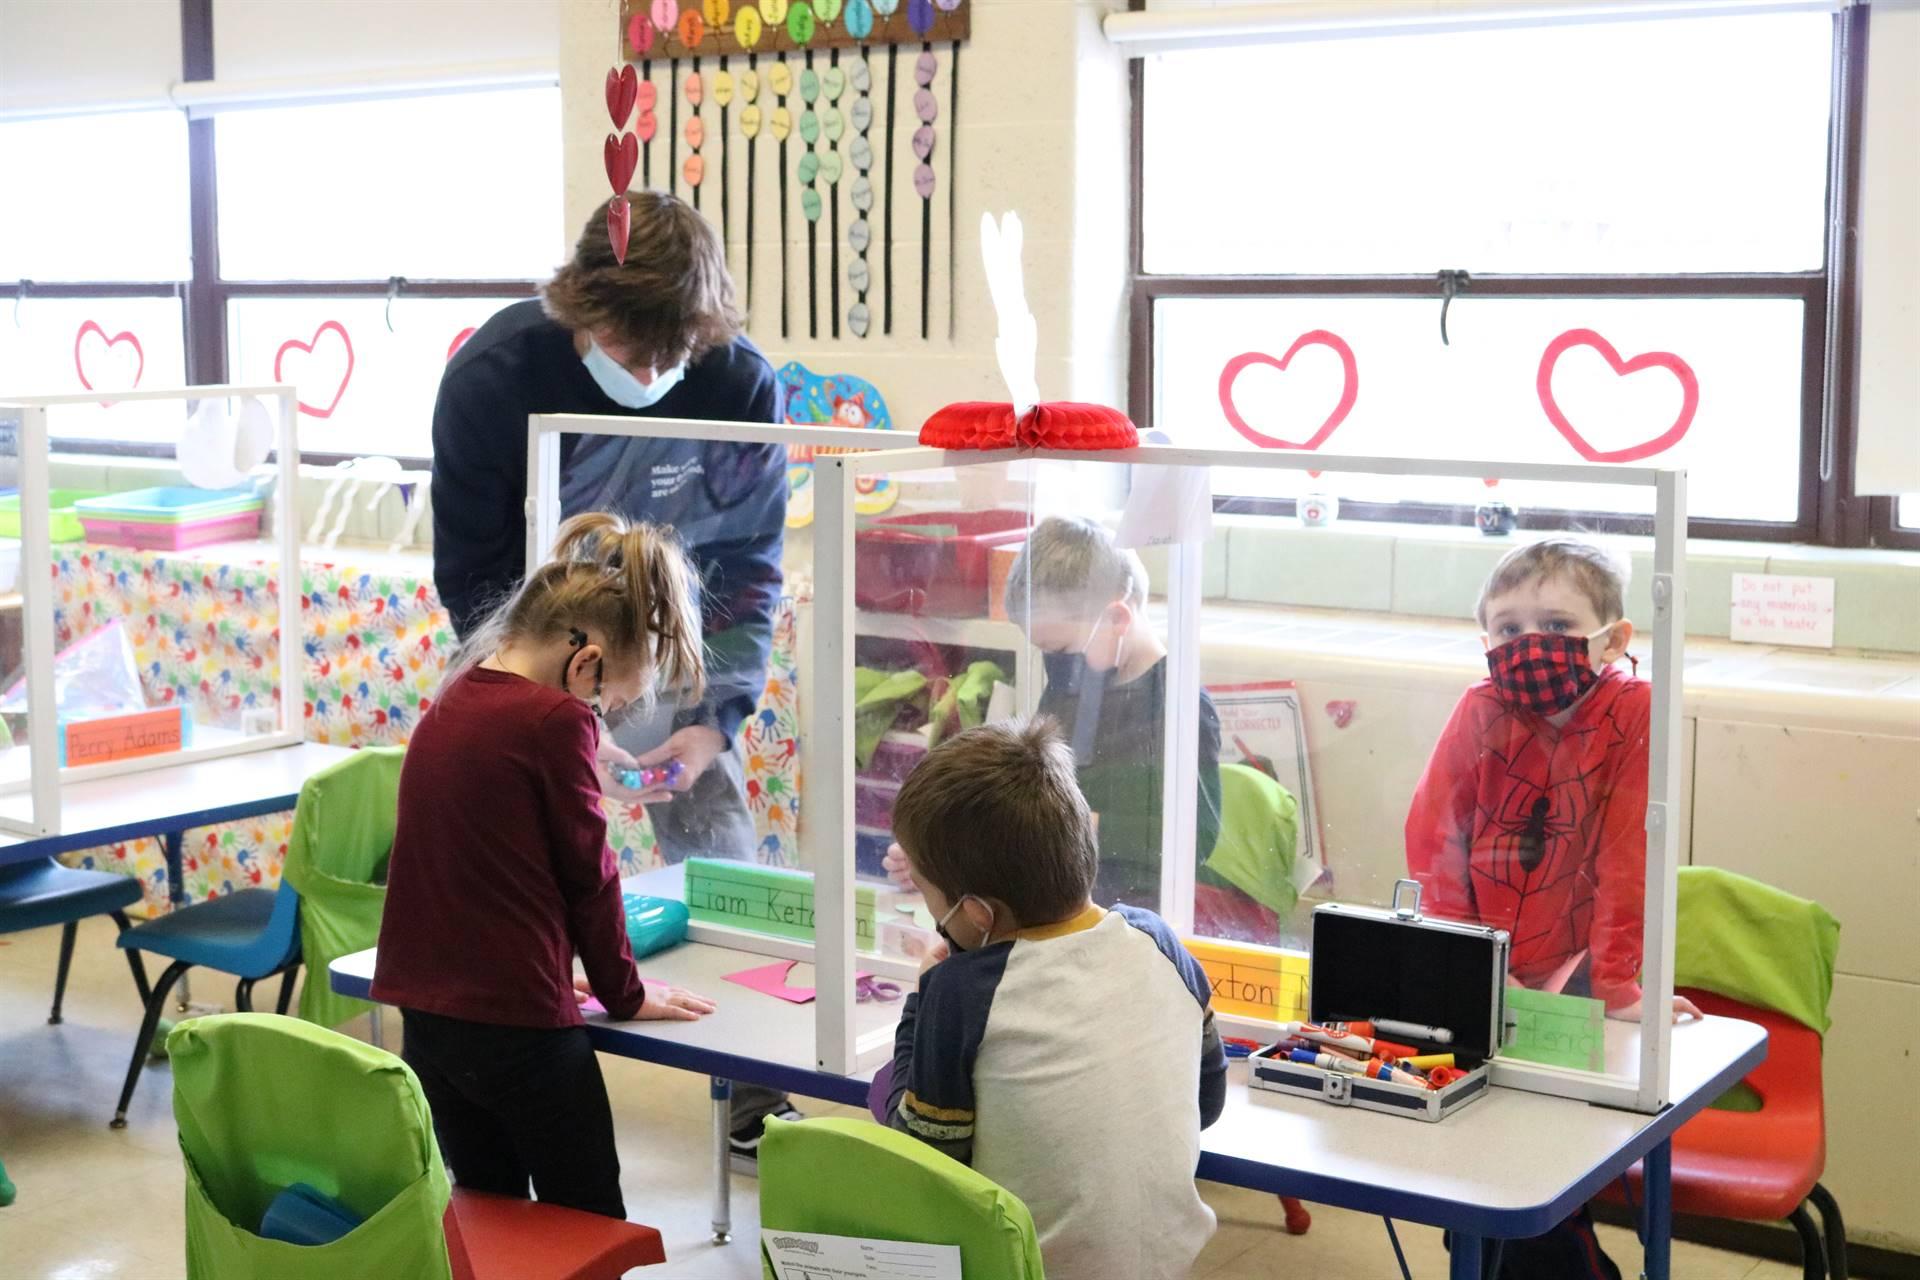 kids standing by desks